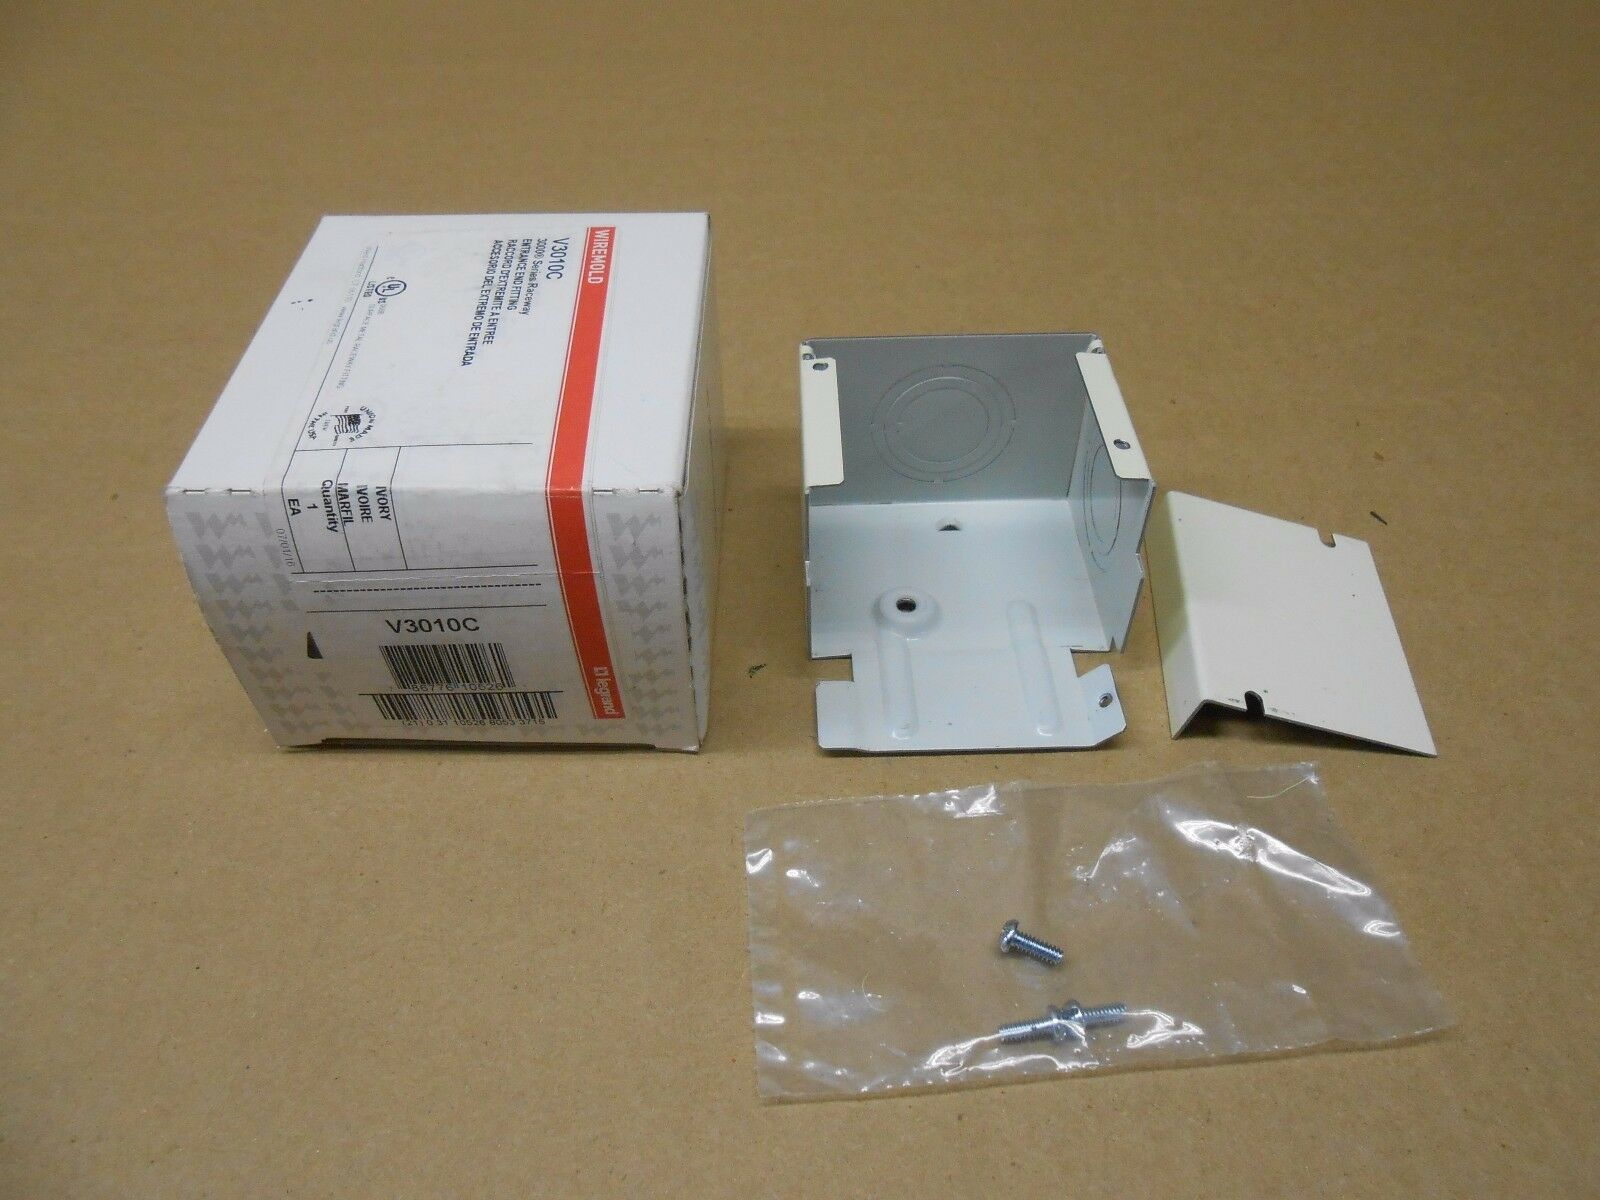 1 Wiremold V3010C Entrance End Fitting 3000 Series Ivory | eBay